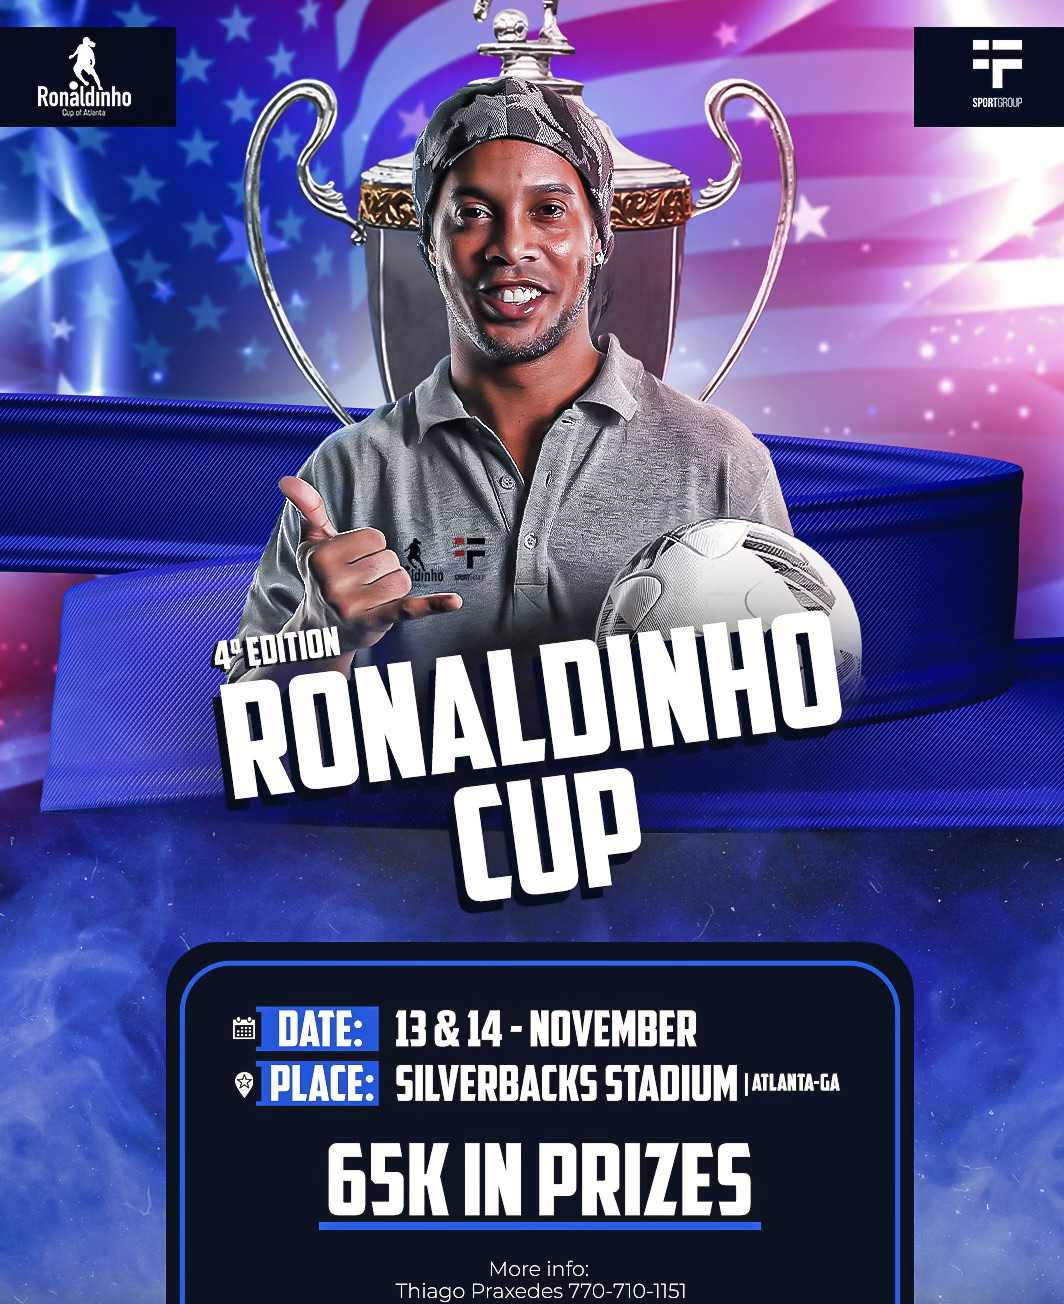 Ronaldinho Cup 2021